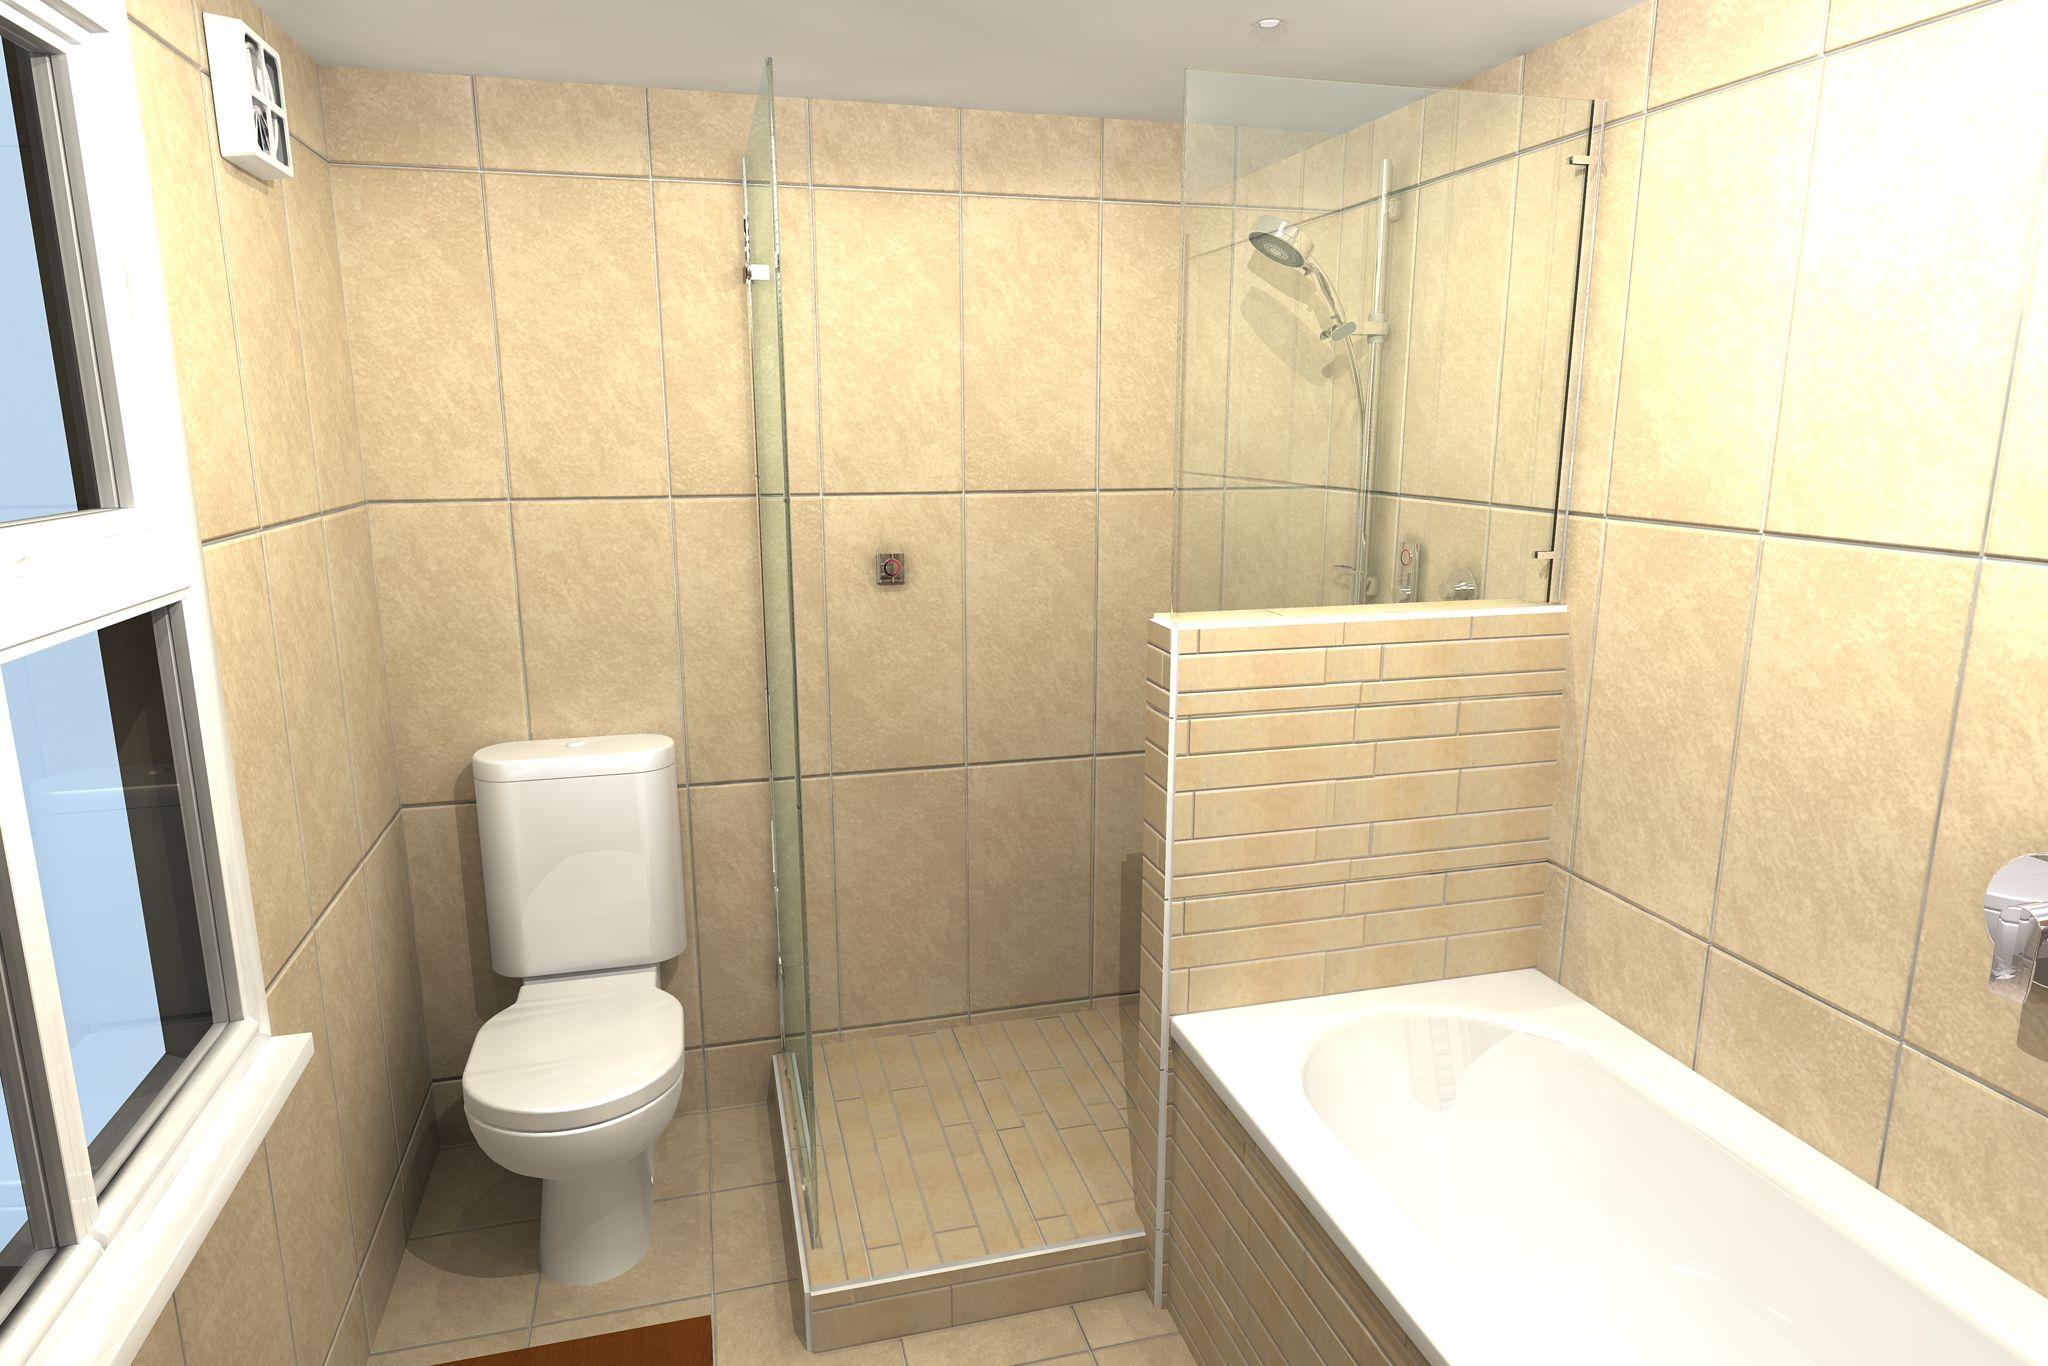 Similar shower/toilet layout | Bathroom Remodel Ideas | Pinterest ...